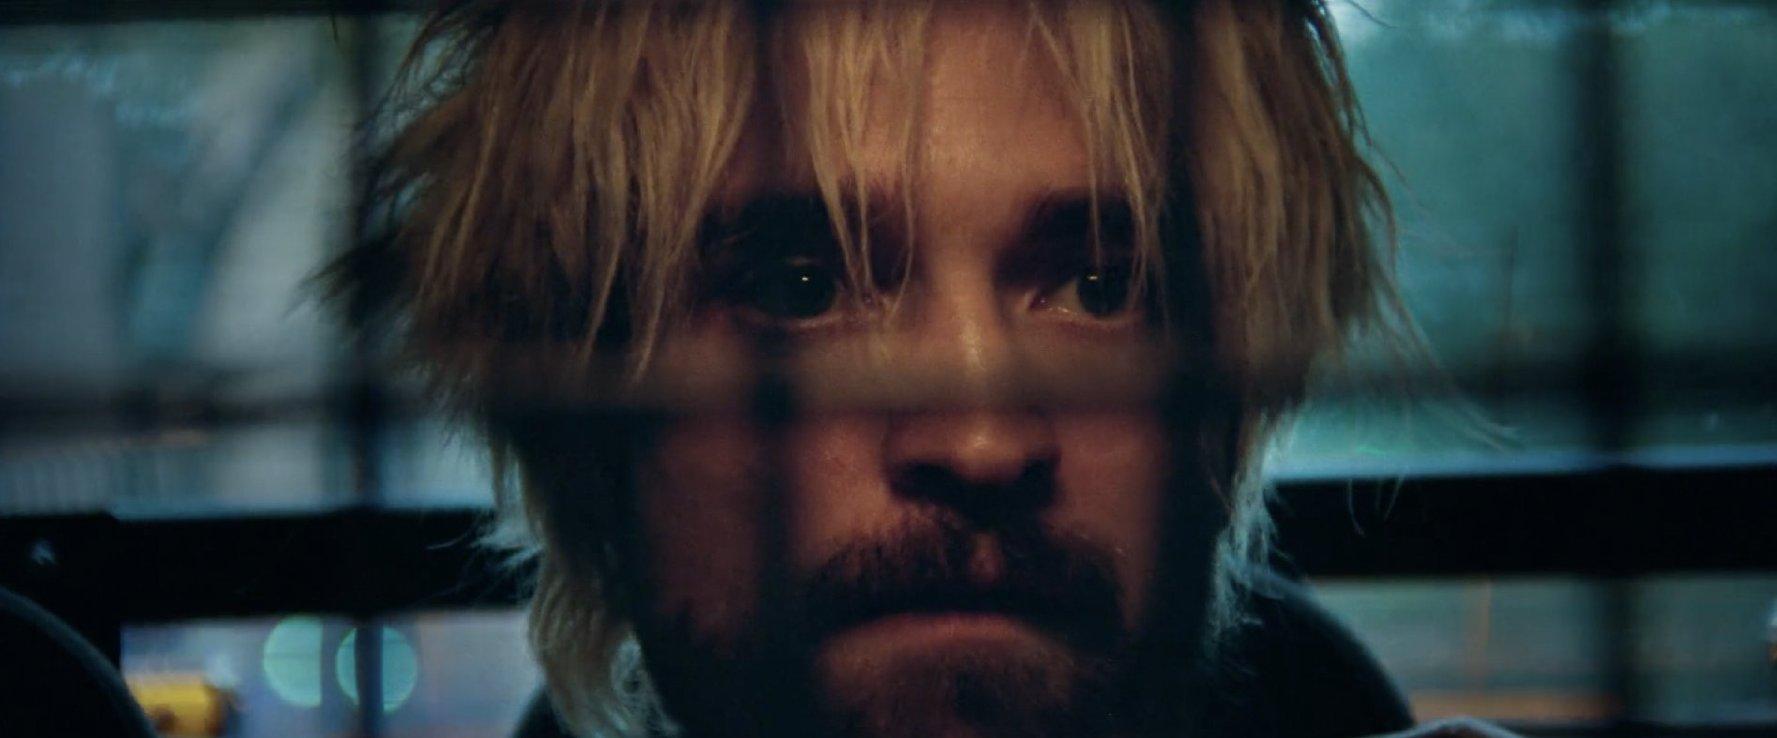 Robert Pattinson dans Good Time de Josh et Benny Safdie